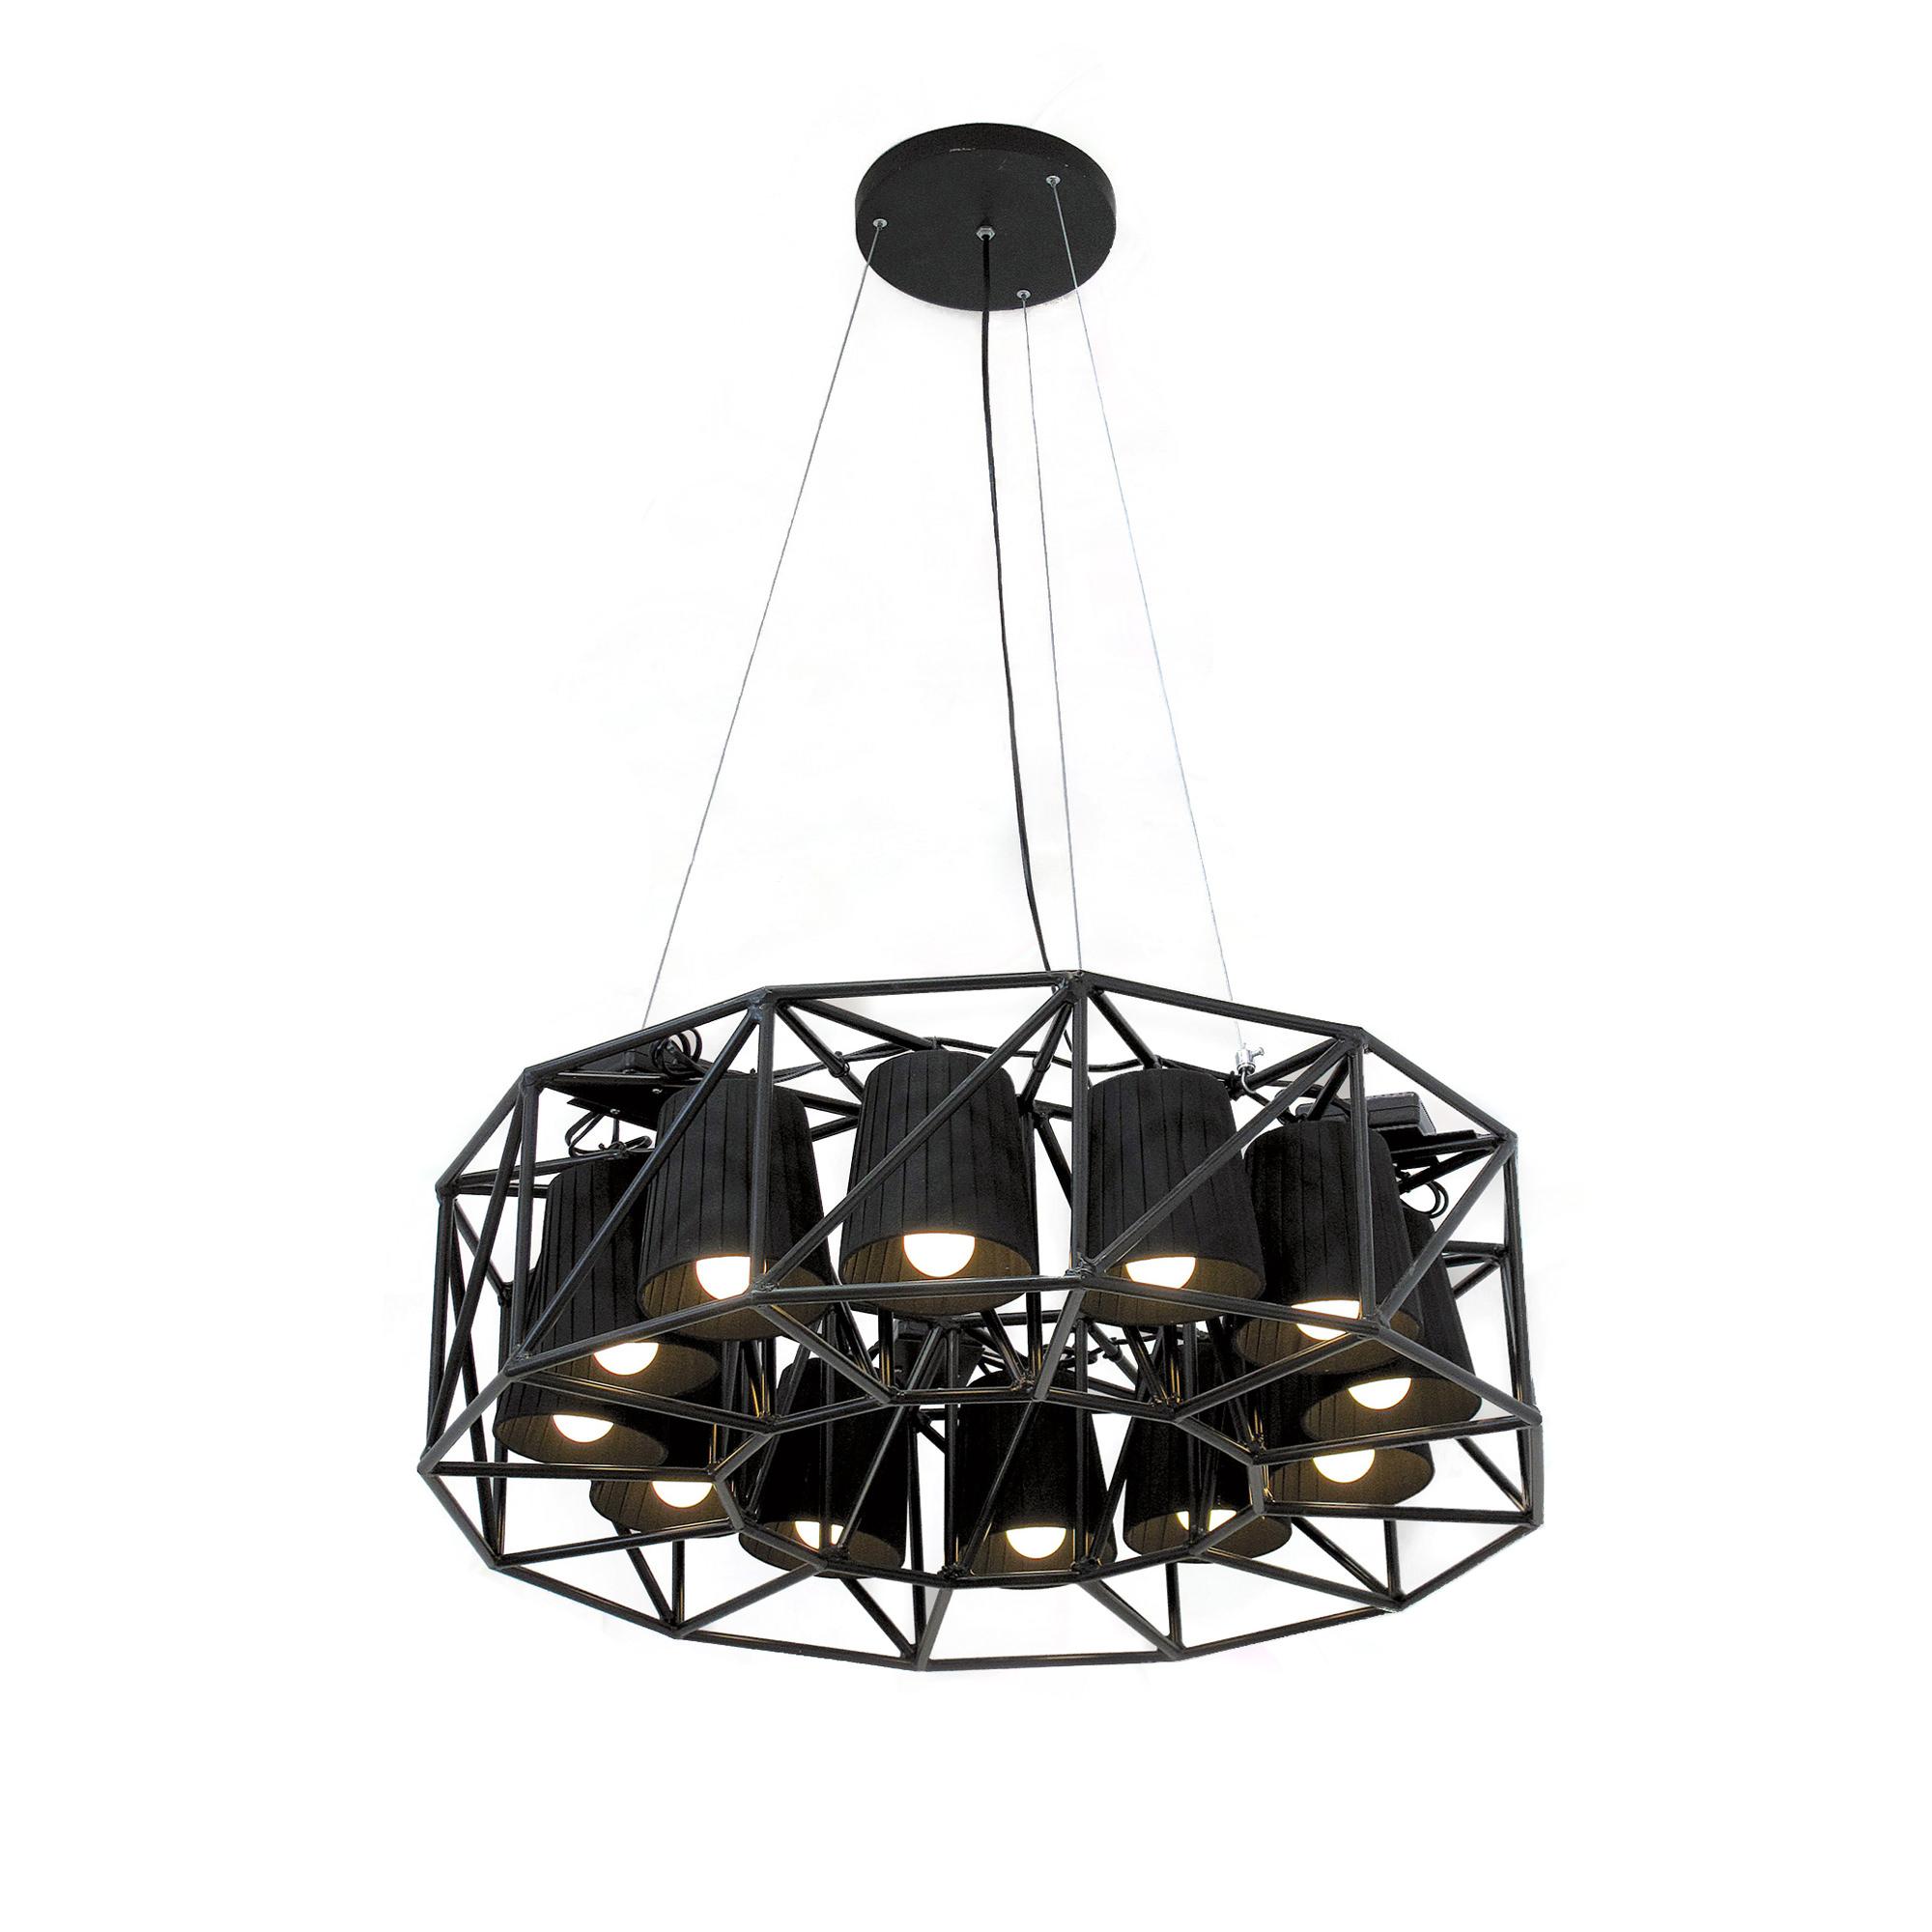 Multilamp Ring Hanging Lamp (Black)  Seletti